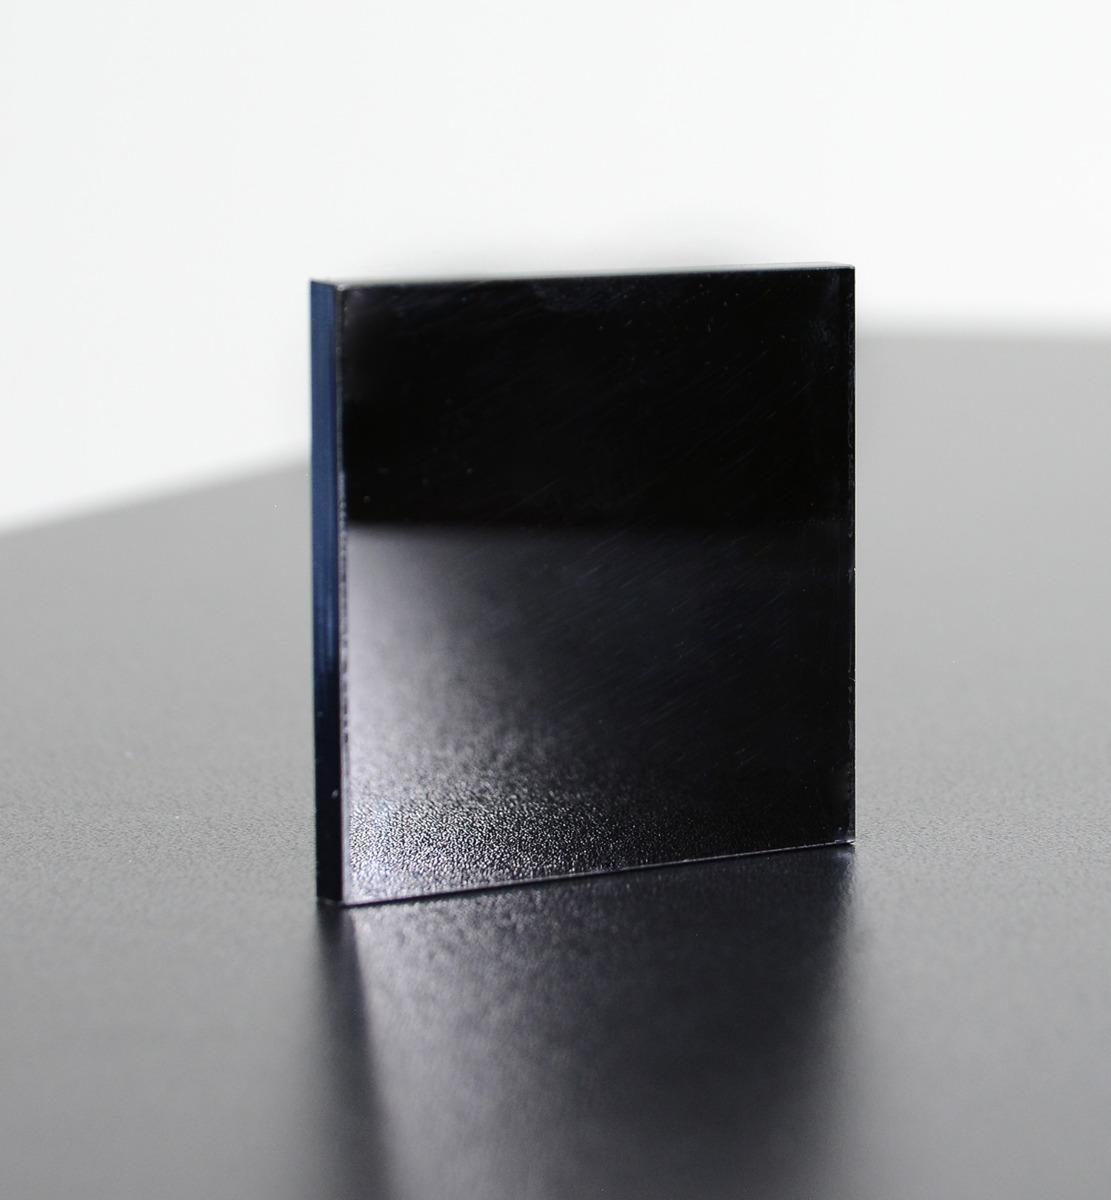 Acrylglassplatte schwarz - Live 2